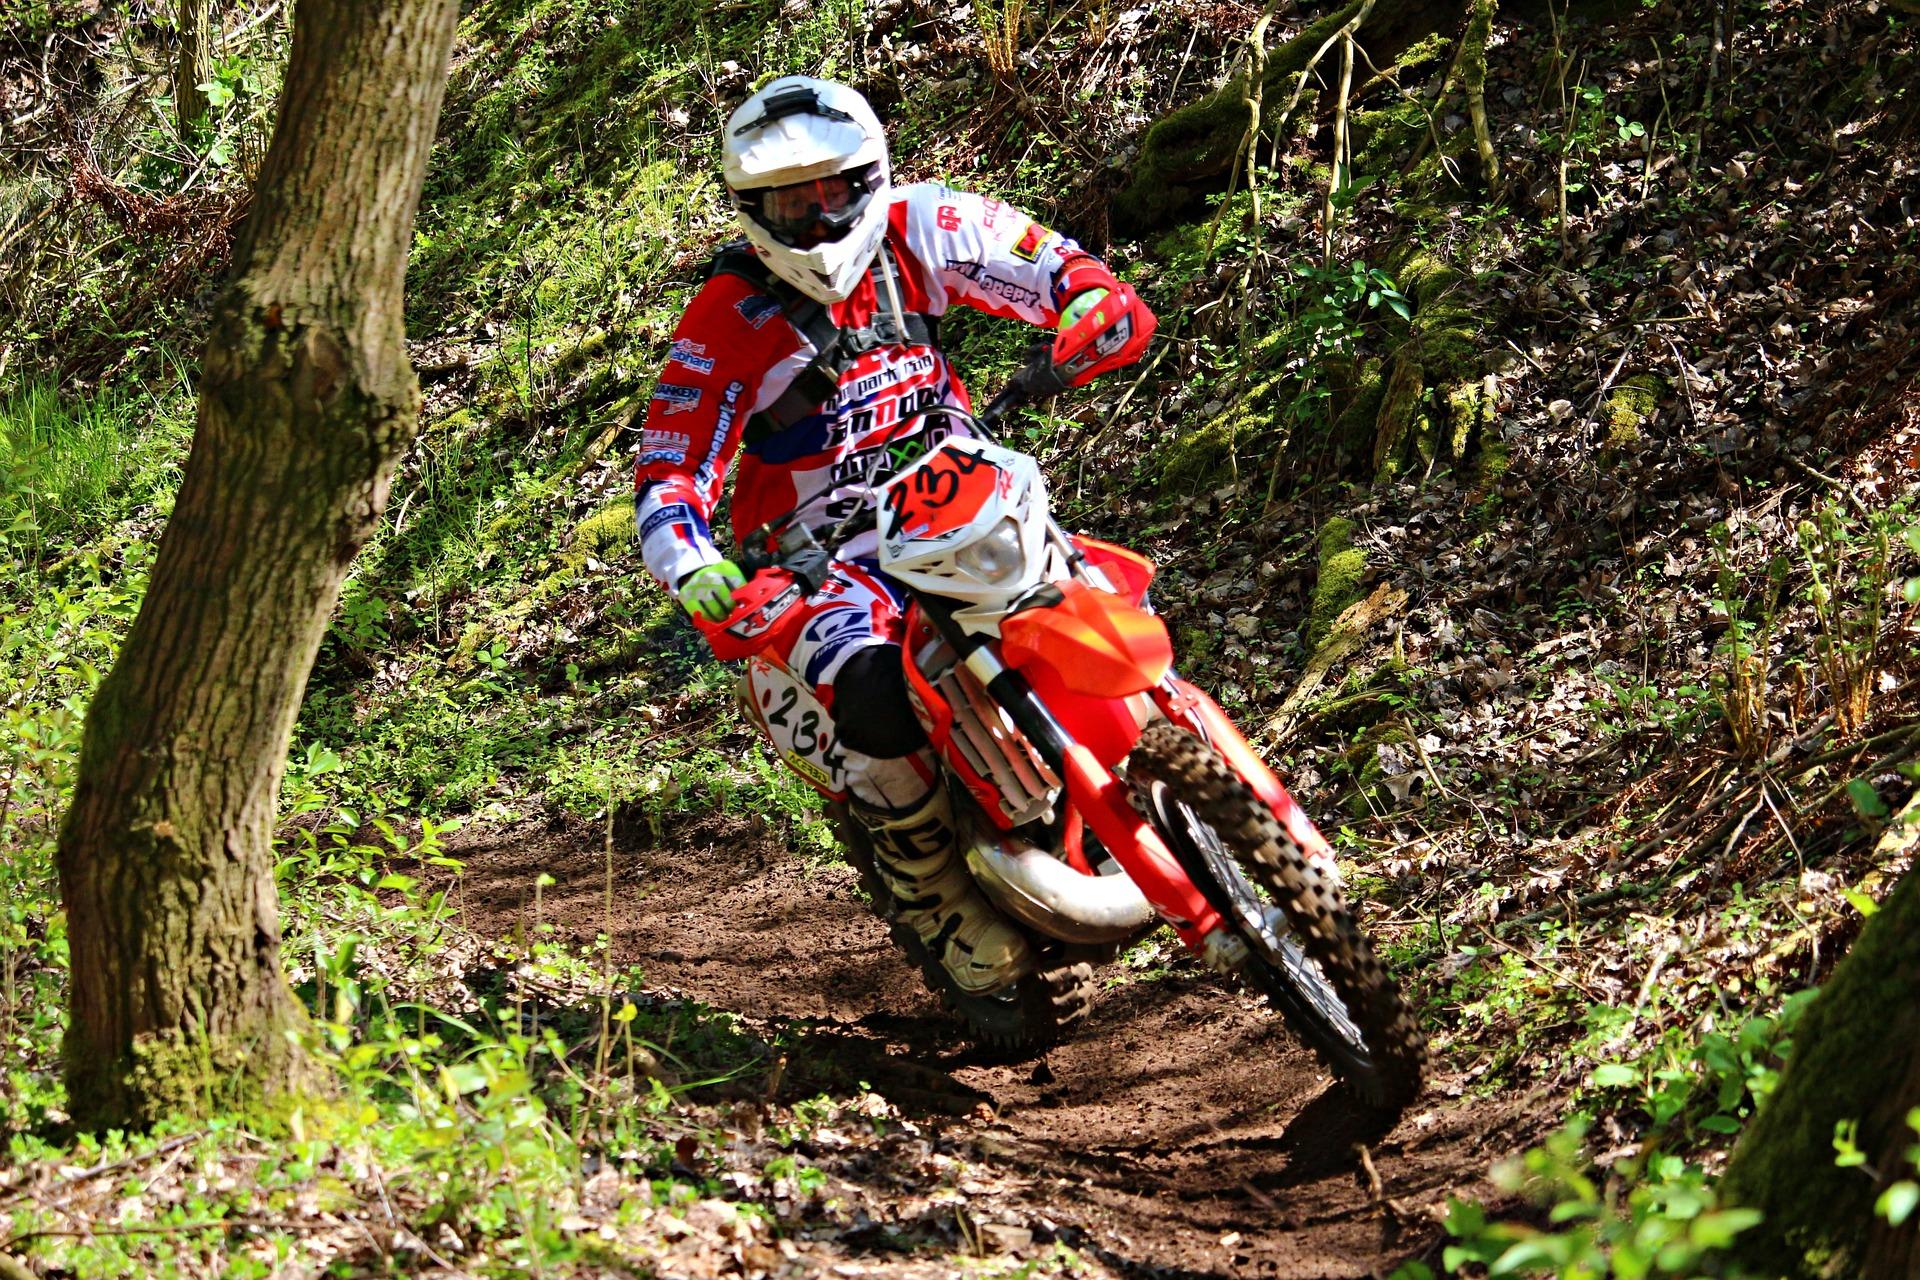 moto, Enduro,  Motocross, risque, domaine, casque - Fonds d'écran HD - Professor-falken.com